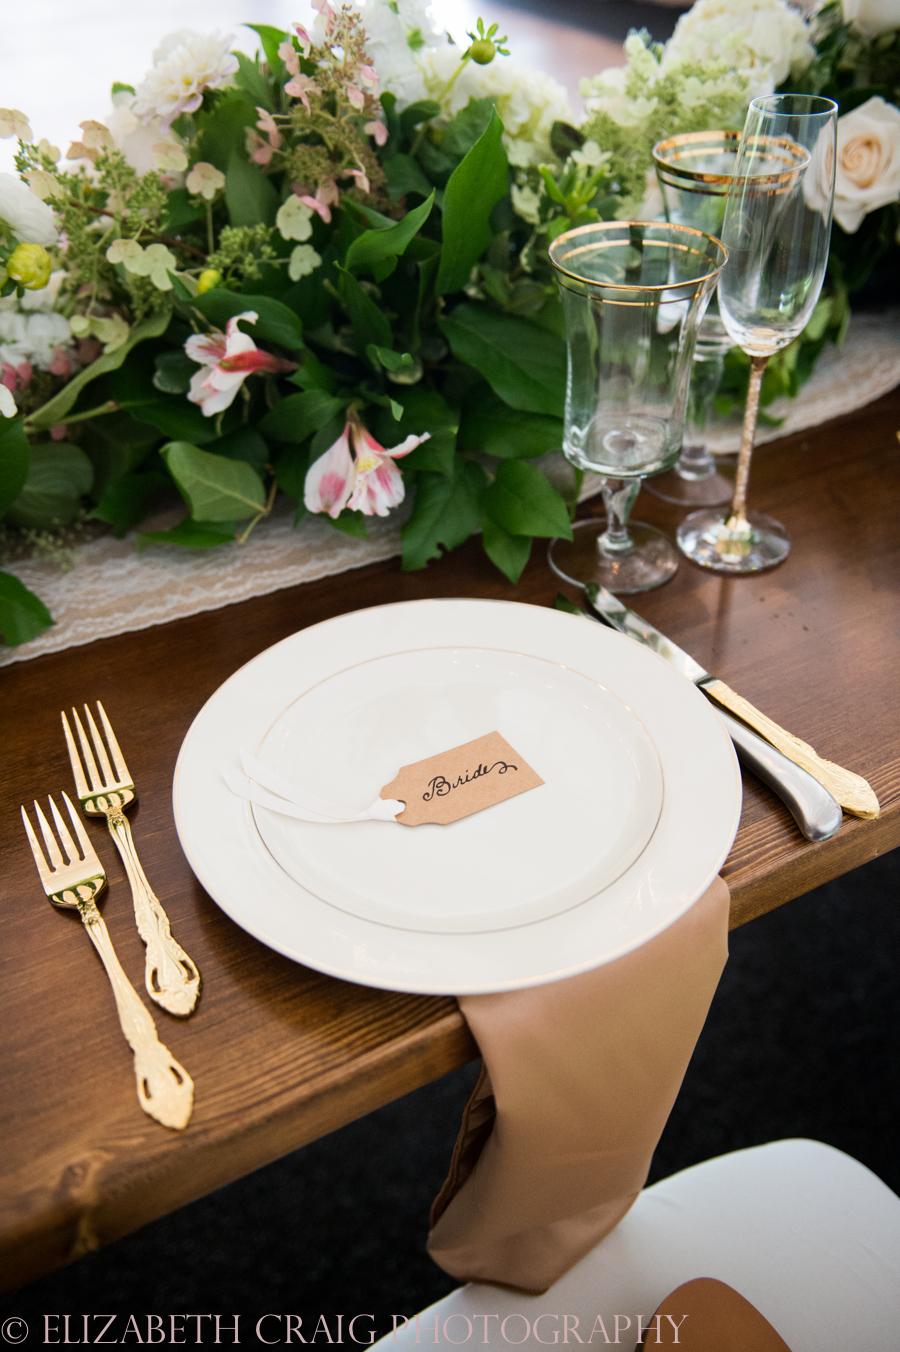 Dubois Brockway St. Marys PA Weddings-0148